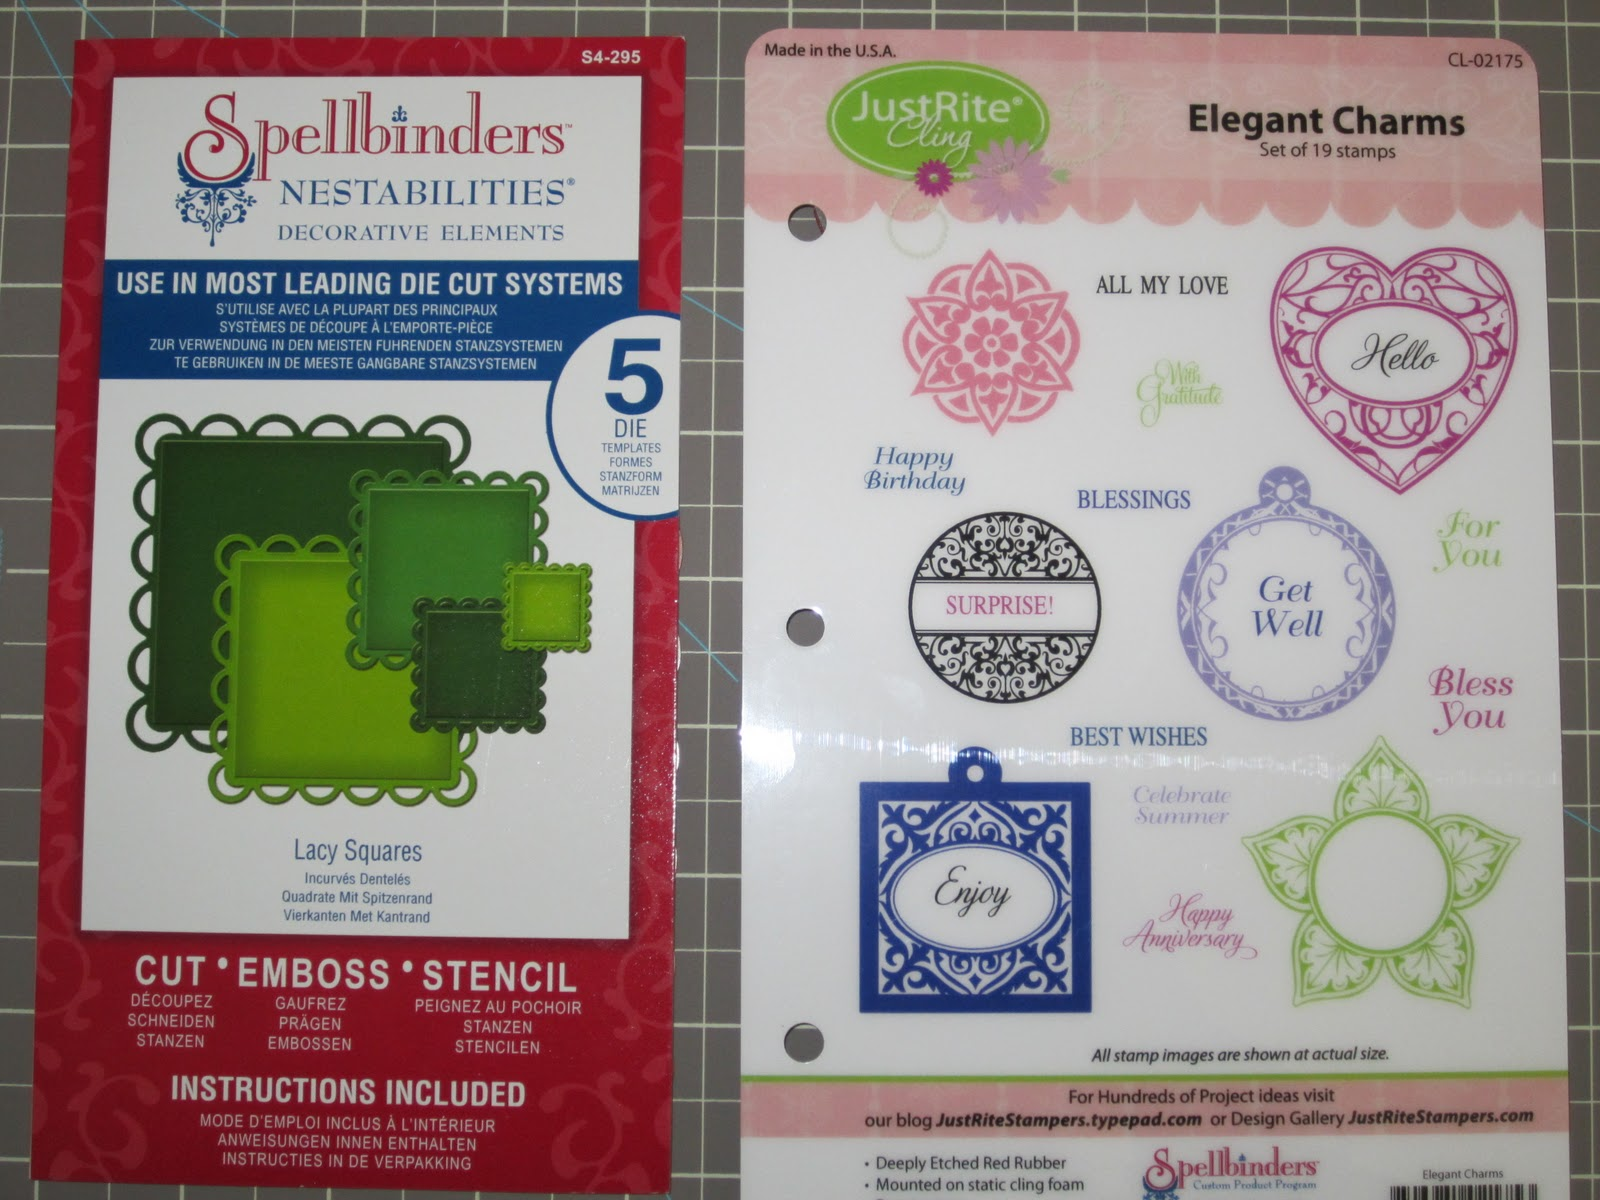 spellbinders grand calibur instructions